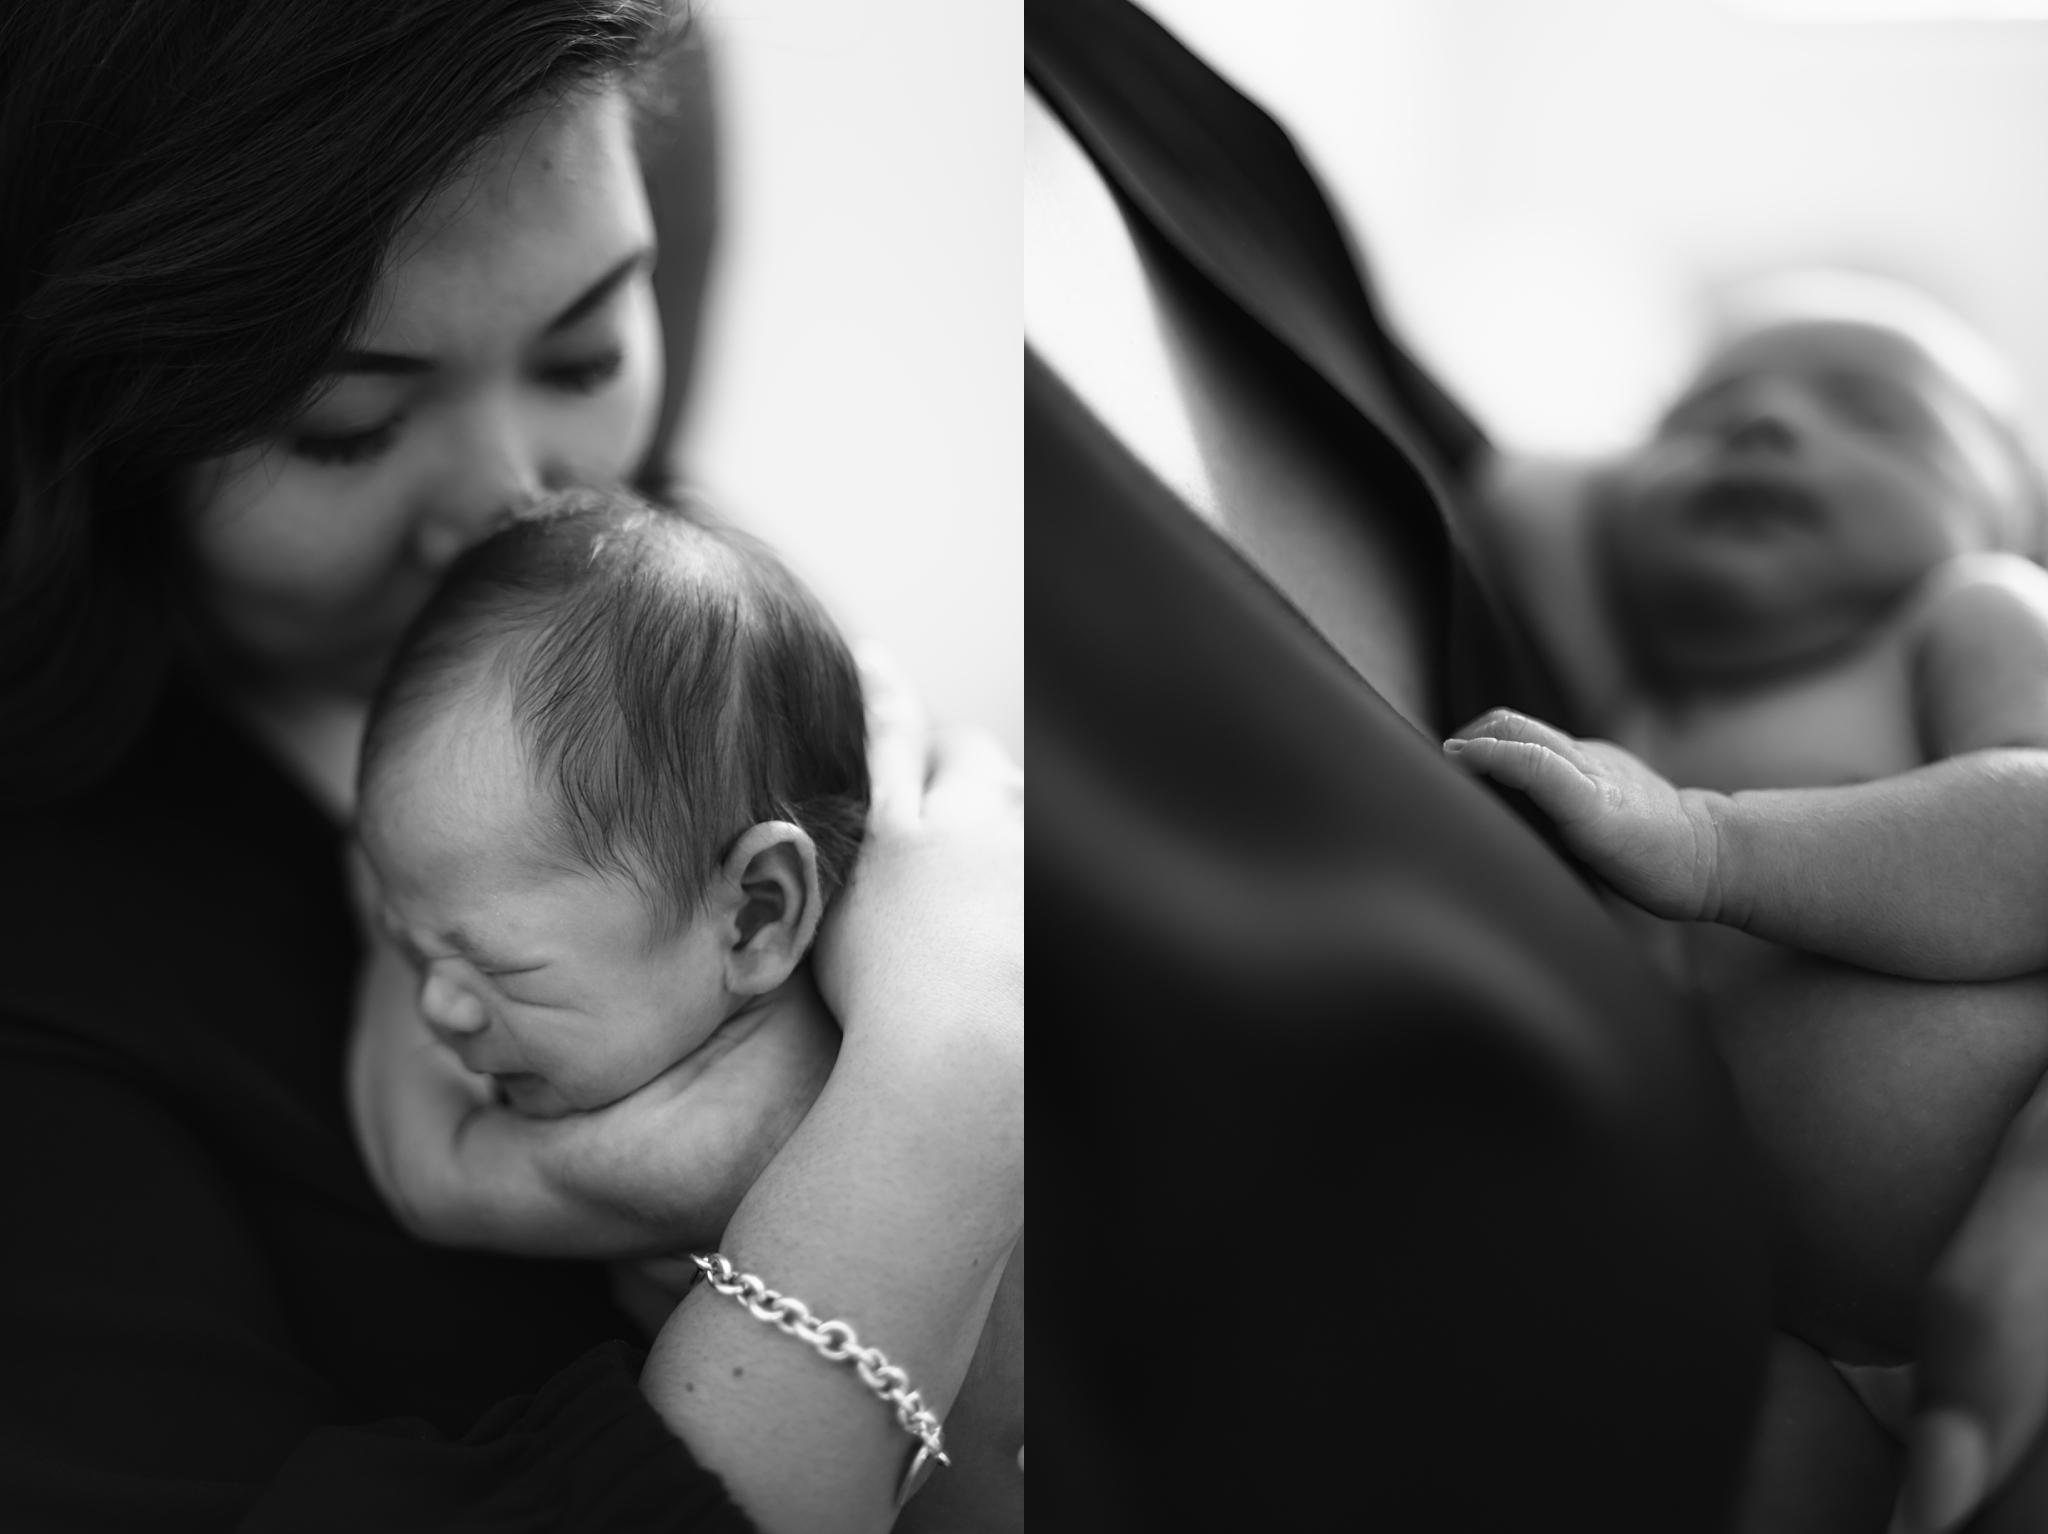 newborn-photo-grapher-hills-district-sydney-the-details-of-a-baby